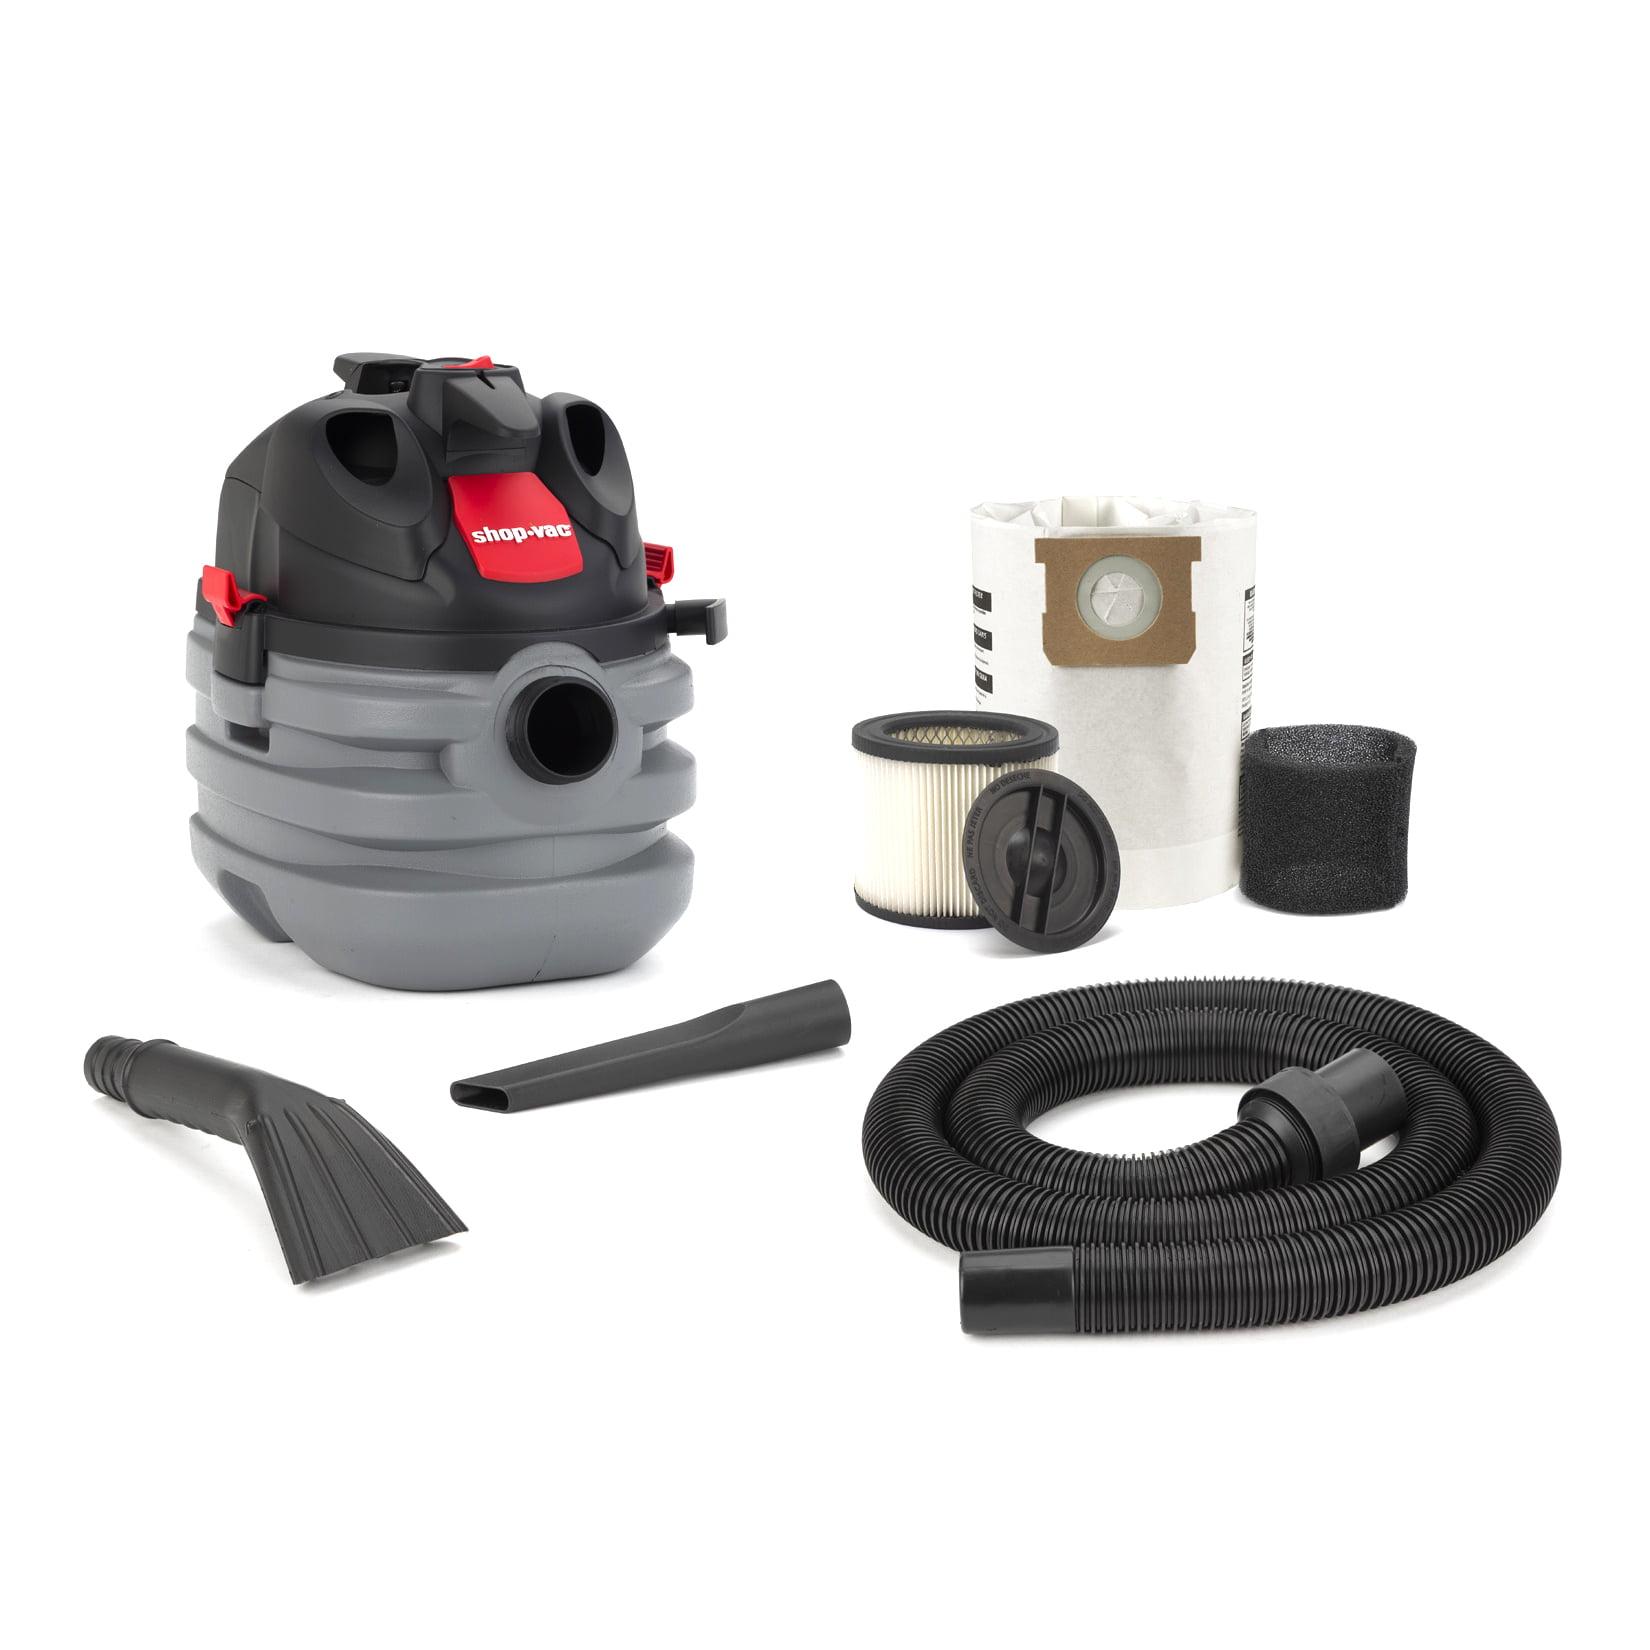 Shop Vac 587-02-00 5 Gallon 6.0 HP Wet & Dry Portable Vacuum